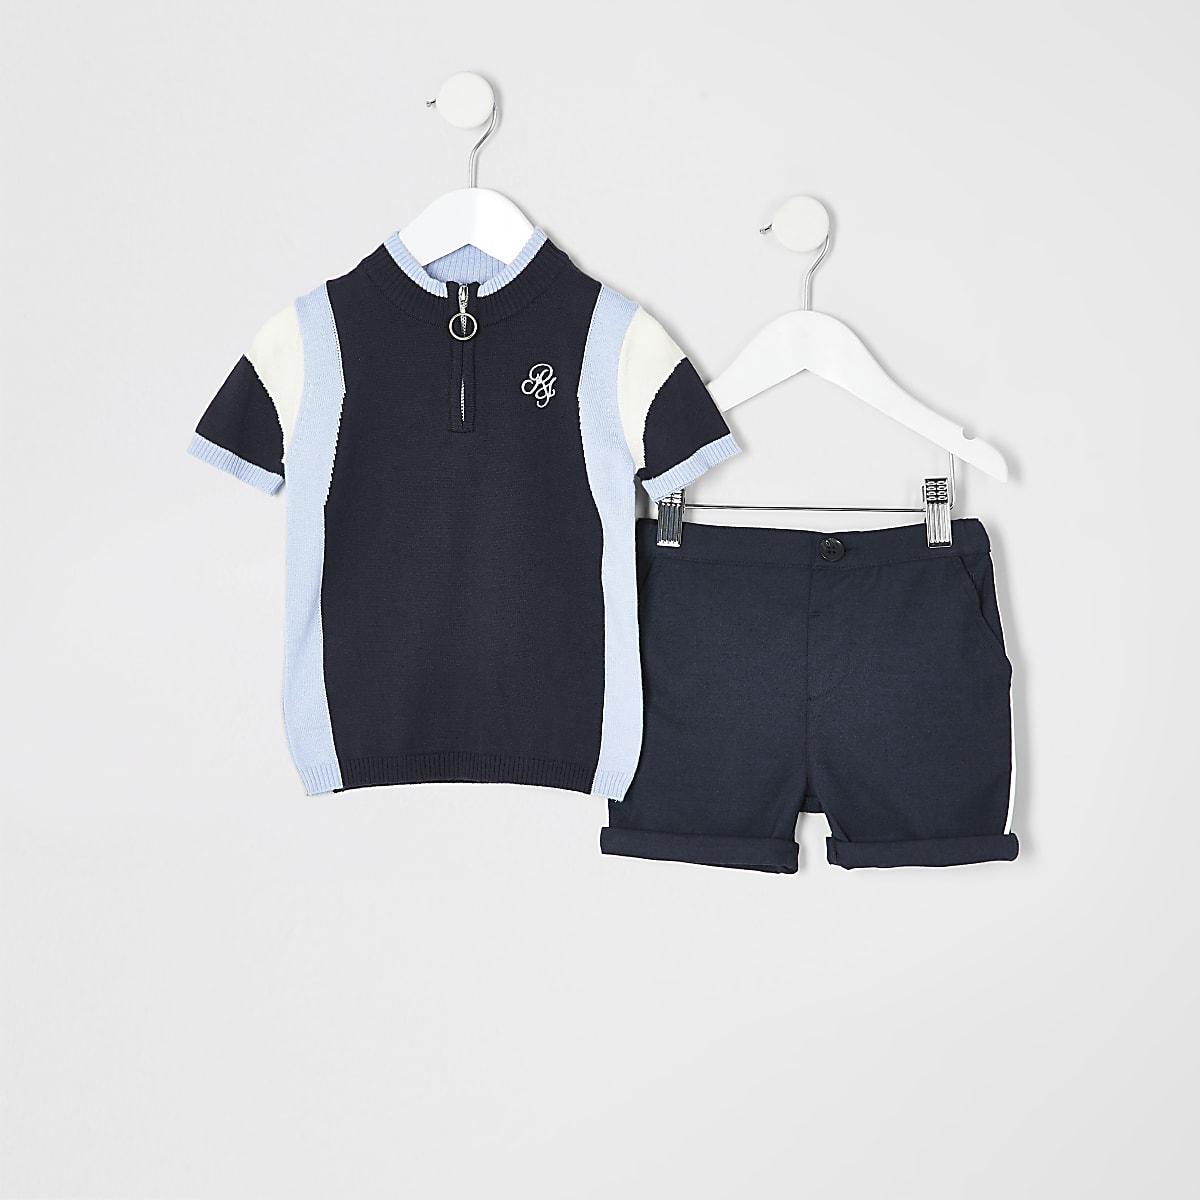 Mini boys blue polo shirt outfit